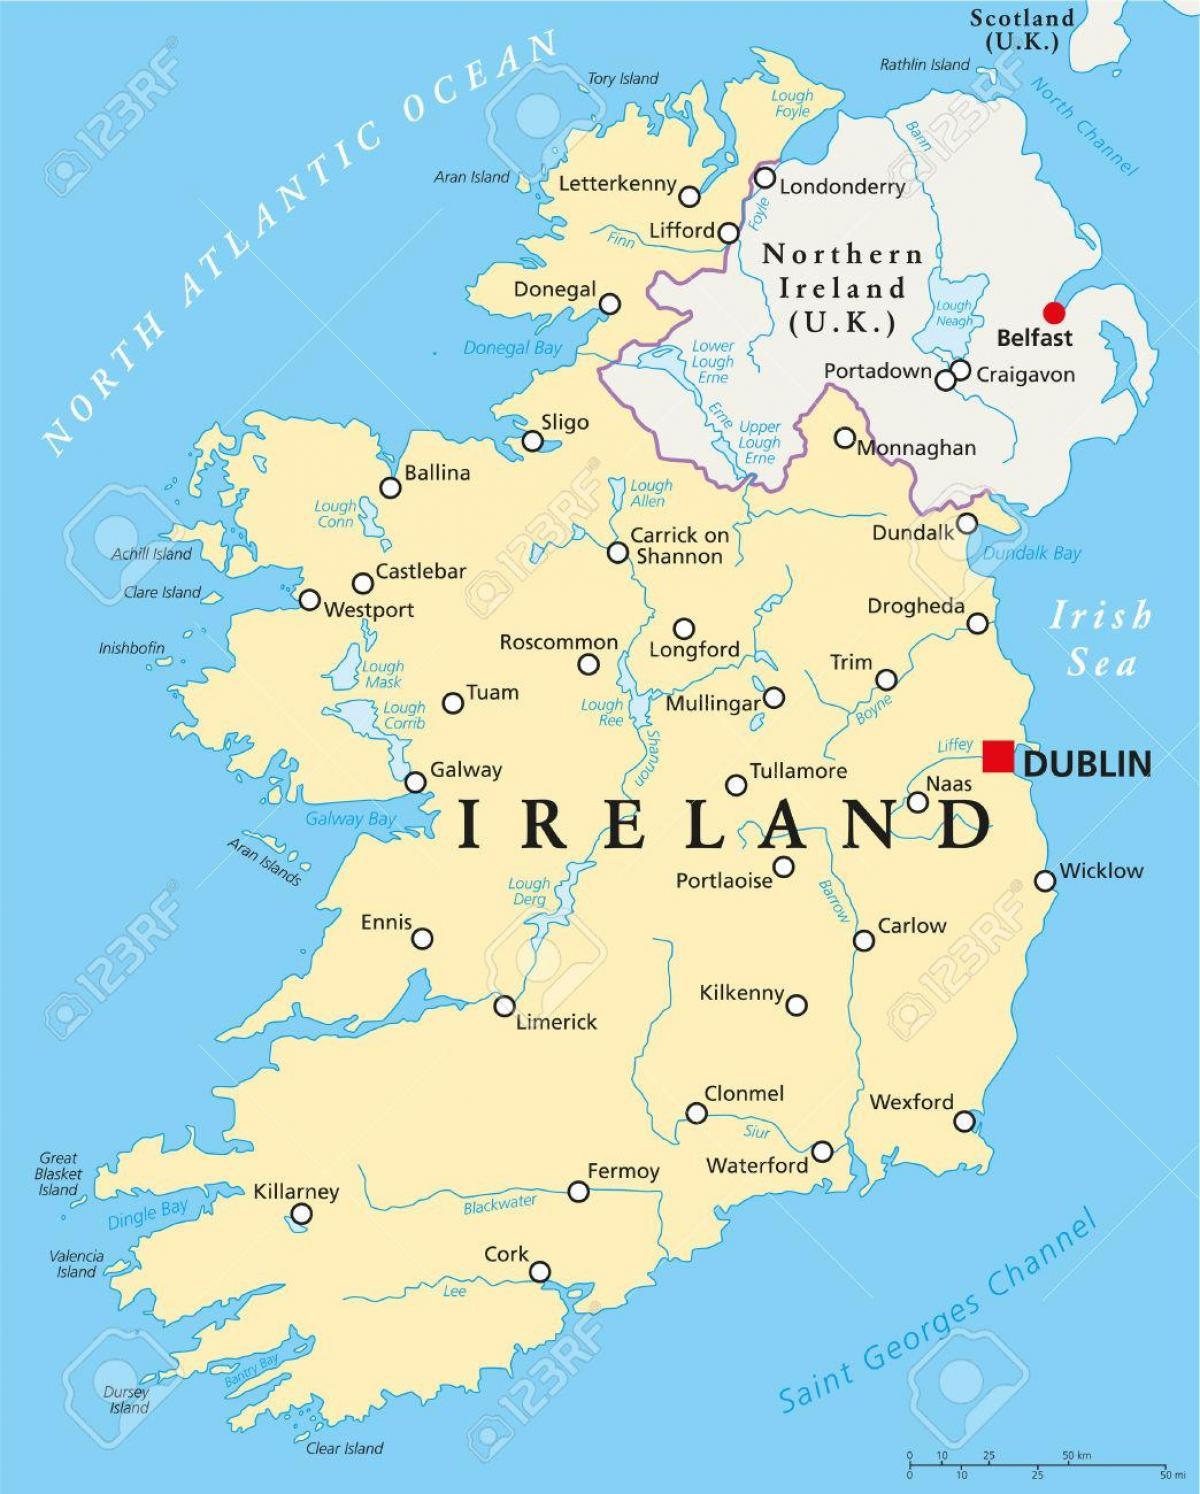 irska mapa Dublin irsko mapa Dublinu, mapa irska (Irsko) irska mapa